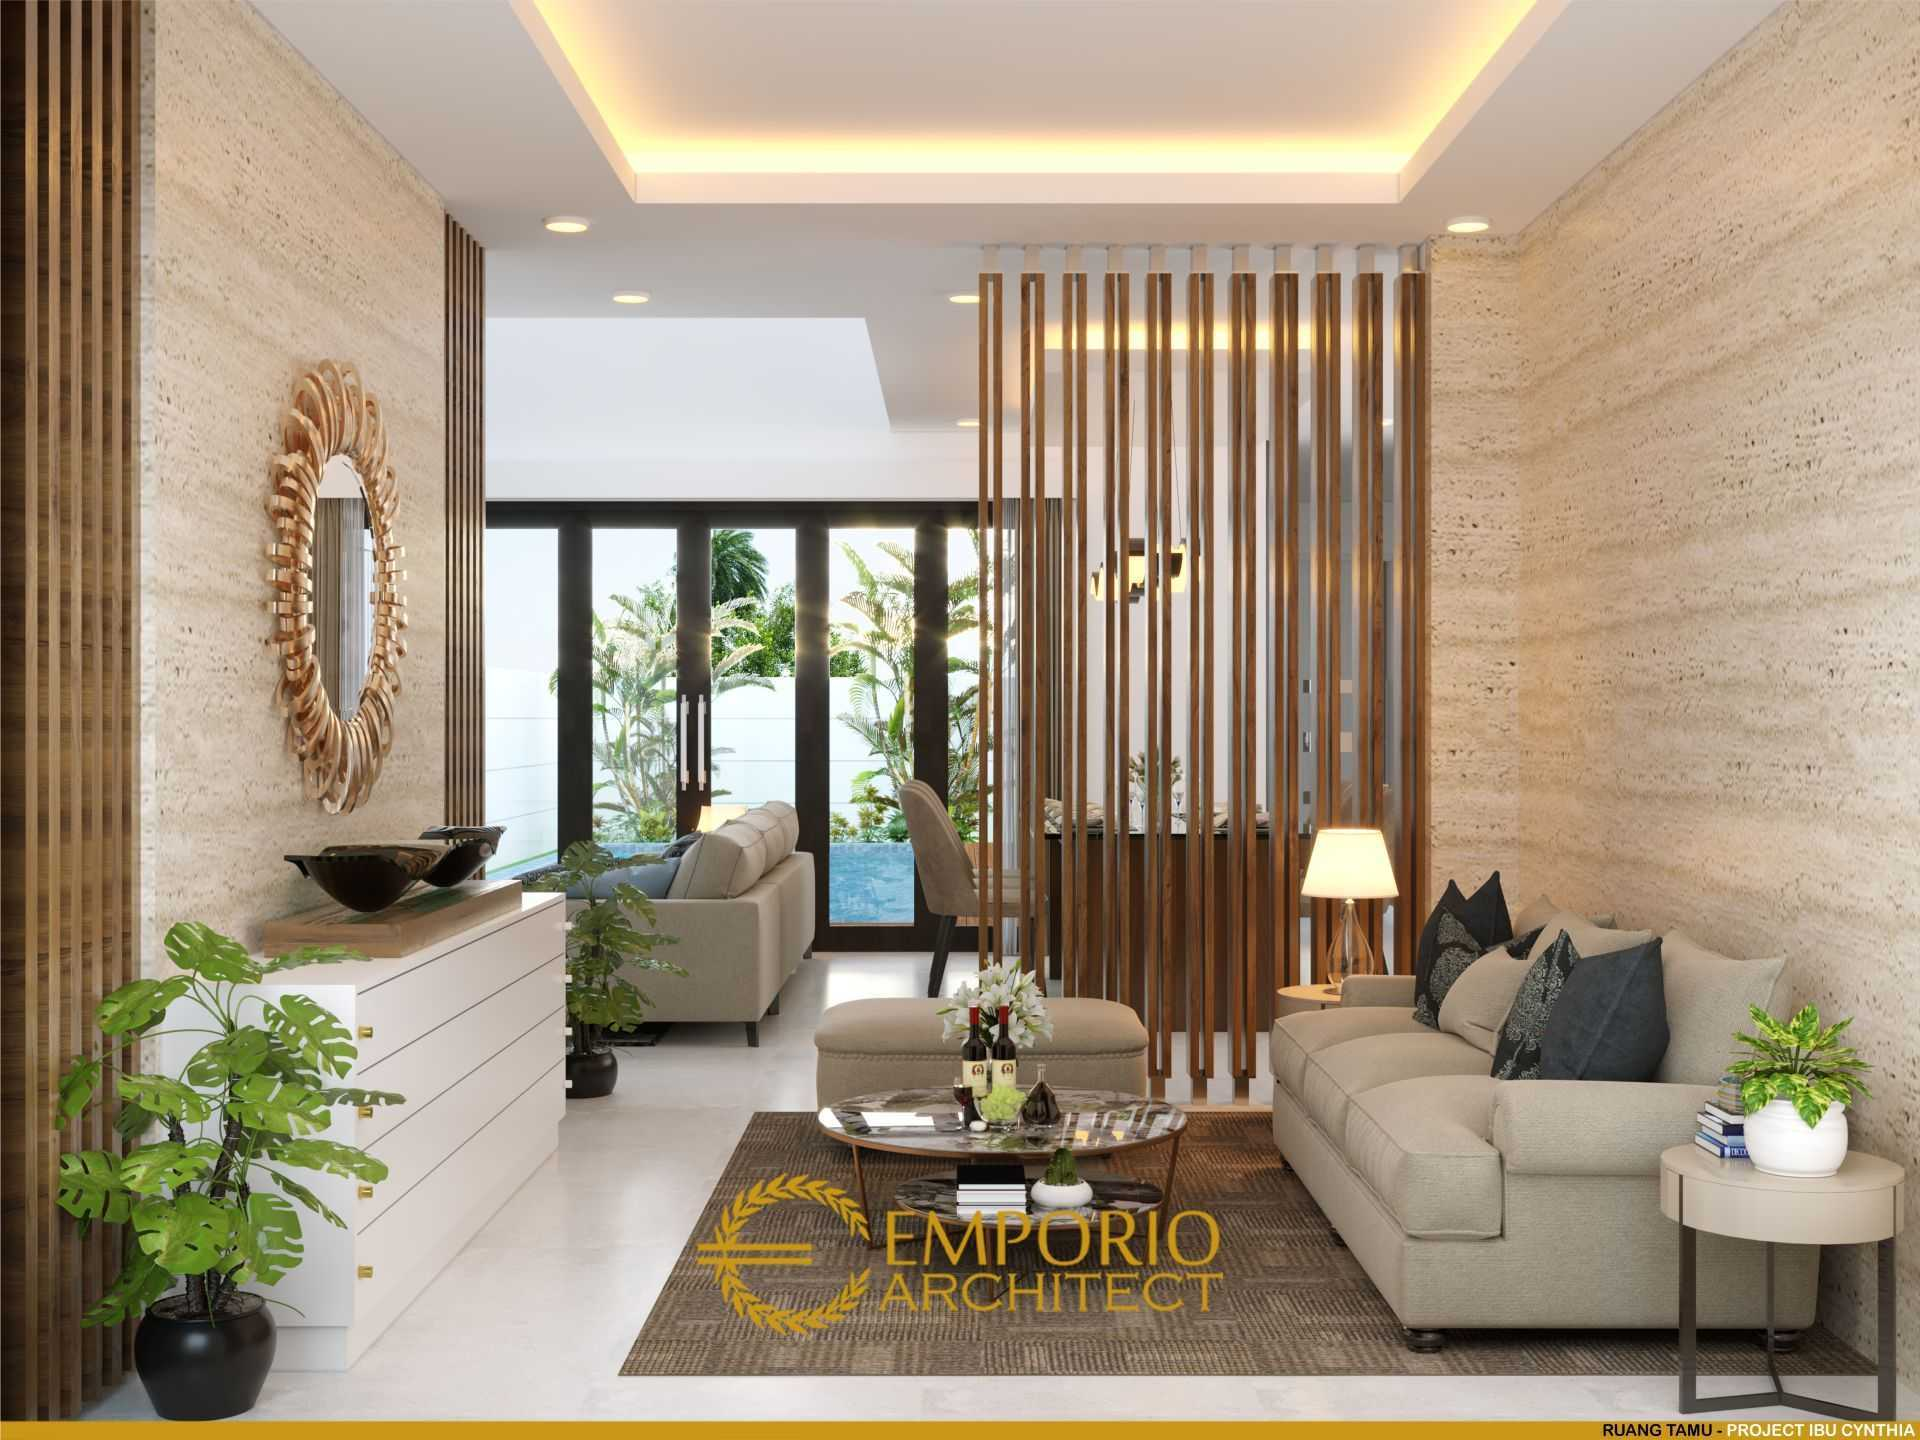 Emporio Architect Jasa Arsitek Pekanbaru Desain Rumah Modern 2 Lantai 824 Di Pekanbaru, Riau Pekanbaru, Kota Pekanbaru, Riau, Indonesia Pekanbaru, Kota Pekanbaru, Riau, Indonesia Emporio-Architect-Jasa-Arsitek-Pekanbaru-Desain-Rumah-Modern-2-Lantai-824-Di-Pekanbaru-Riau  94134